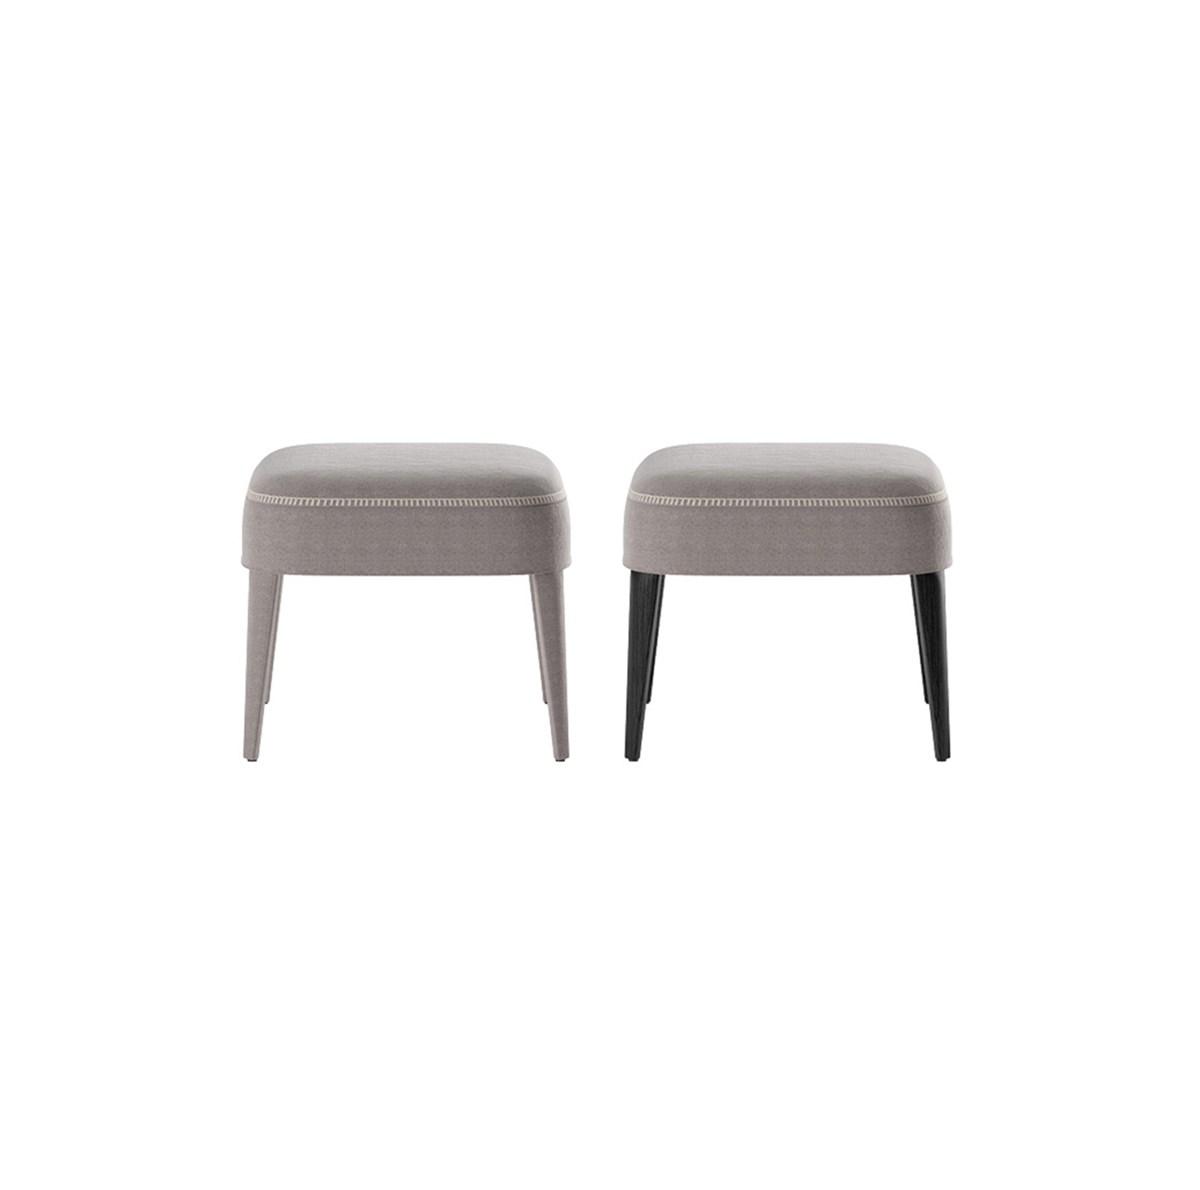 Maxalto-Antonio-Citterio-Febo-Sofa-Matisse-4